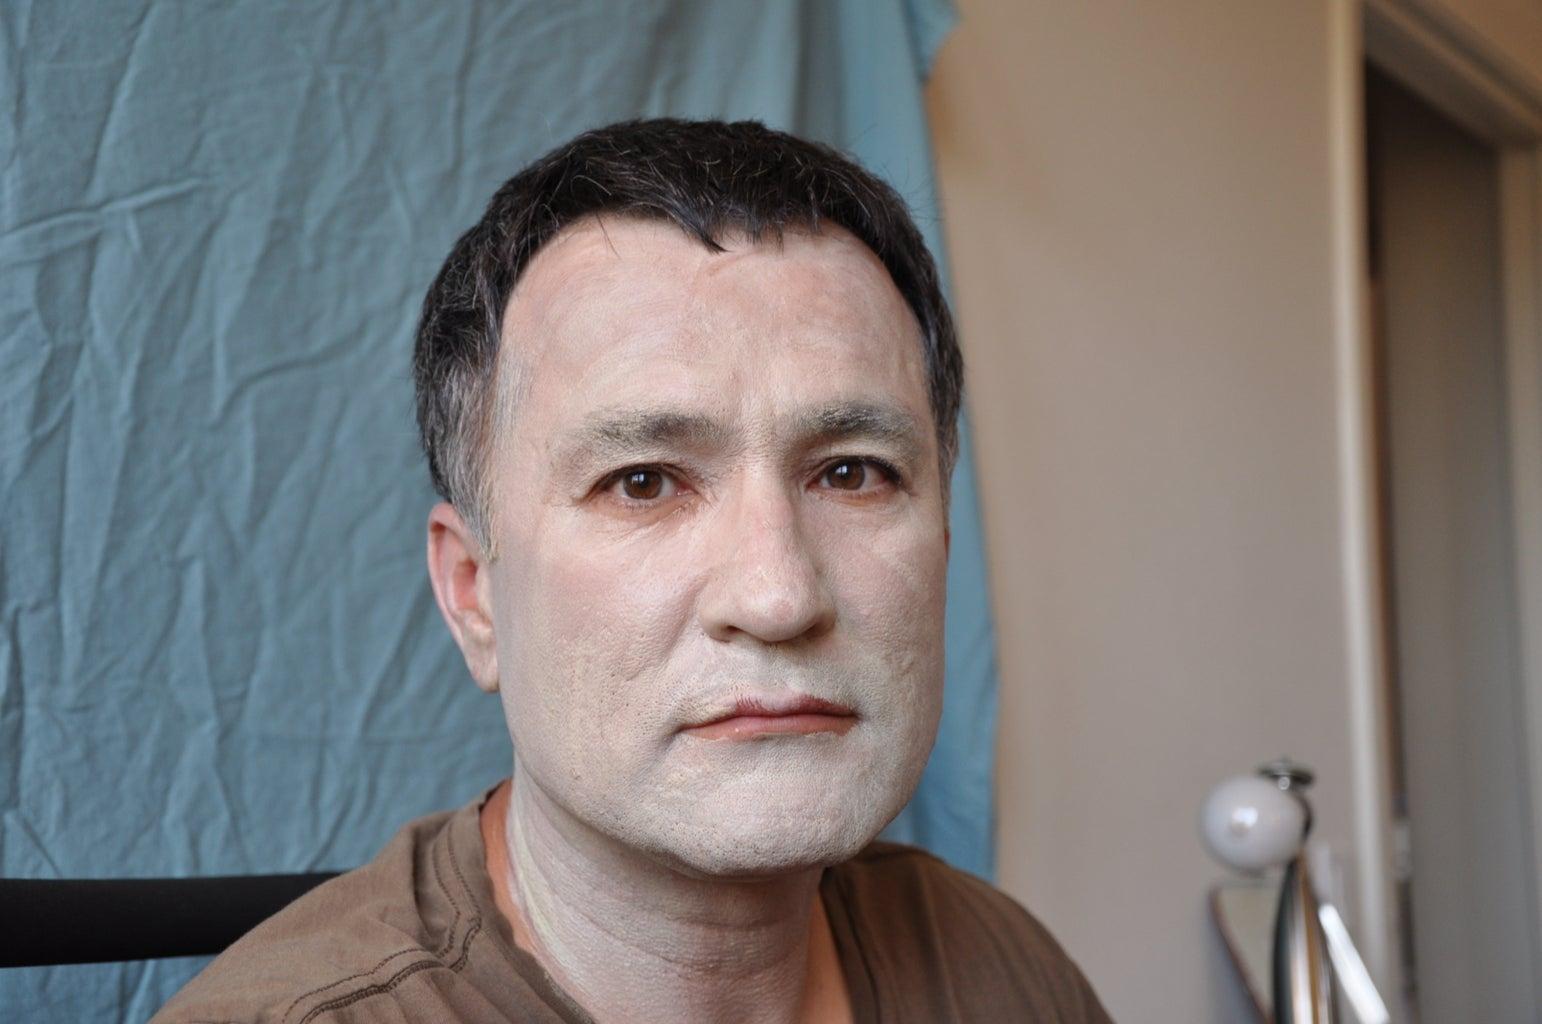 Part 2 - the Zombie: Face Base